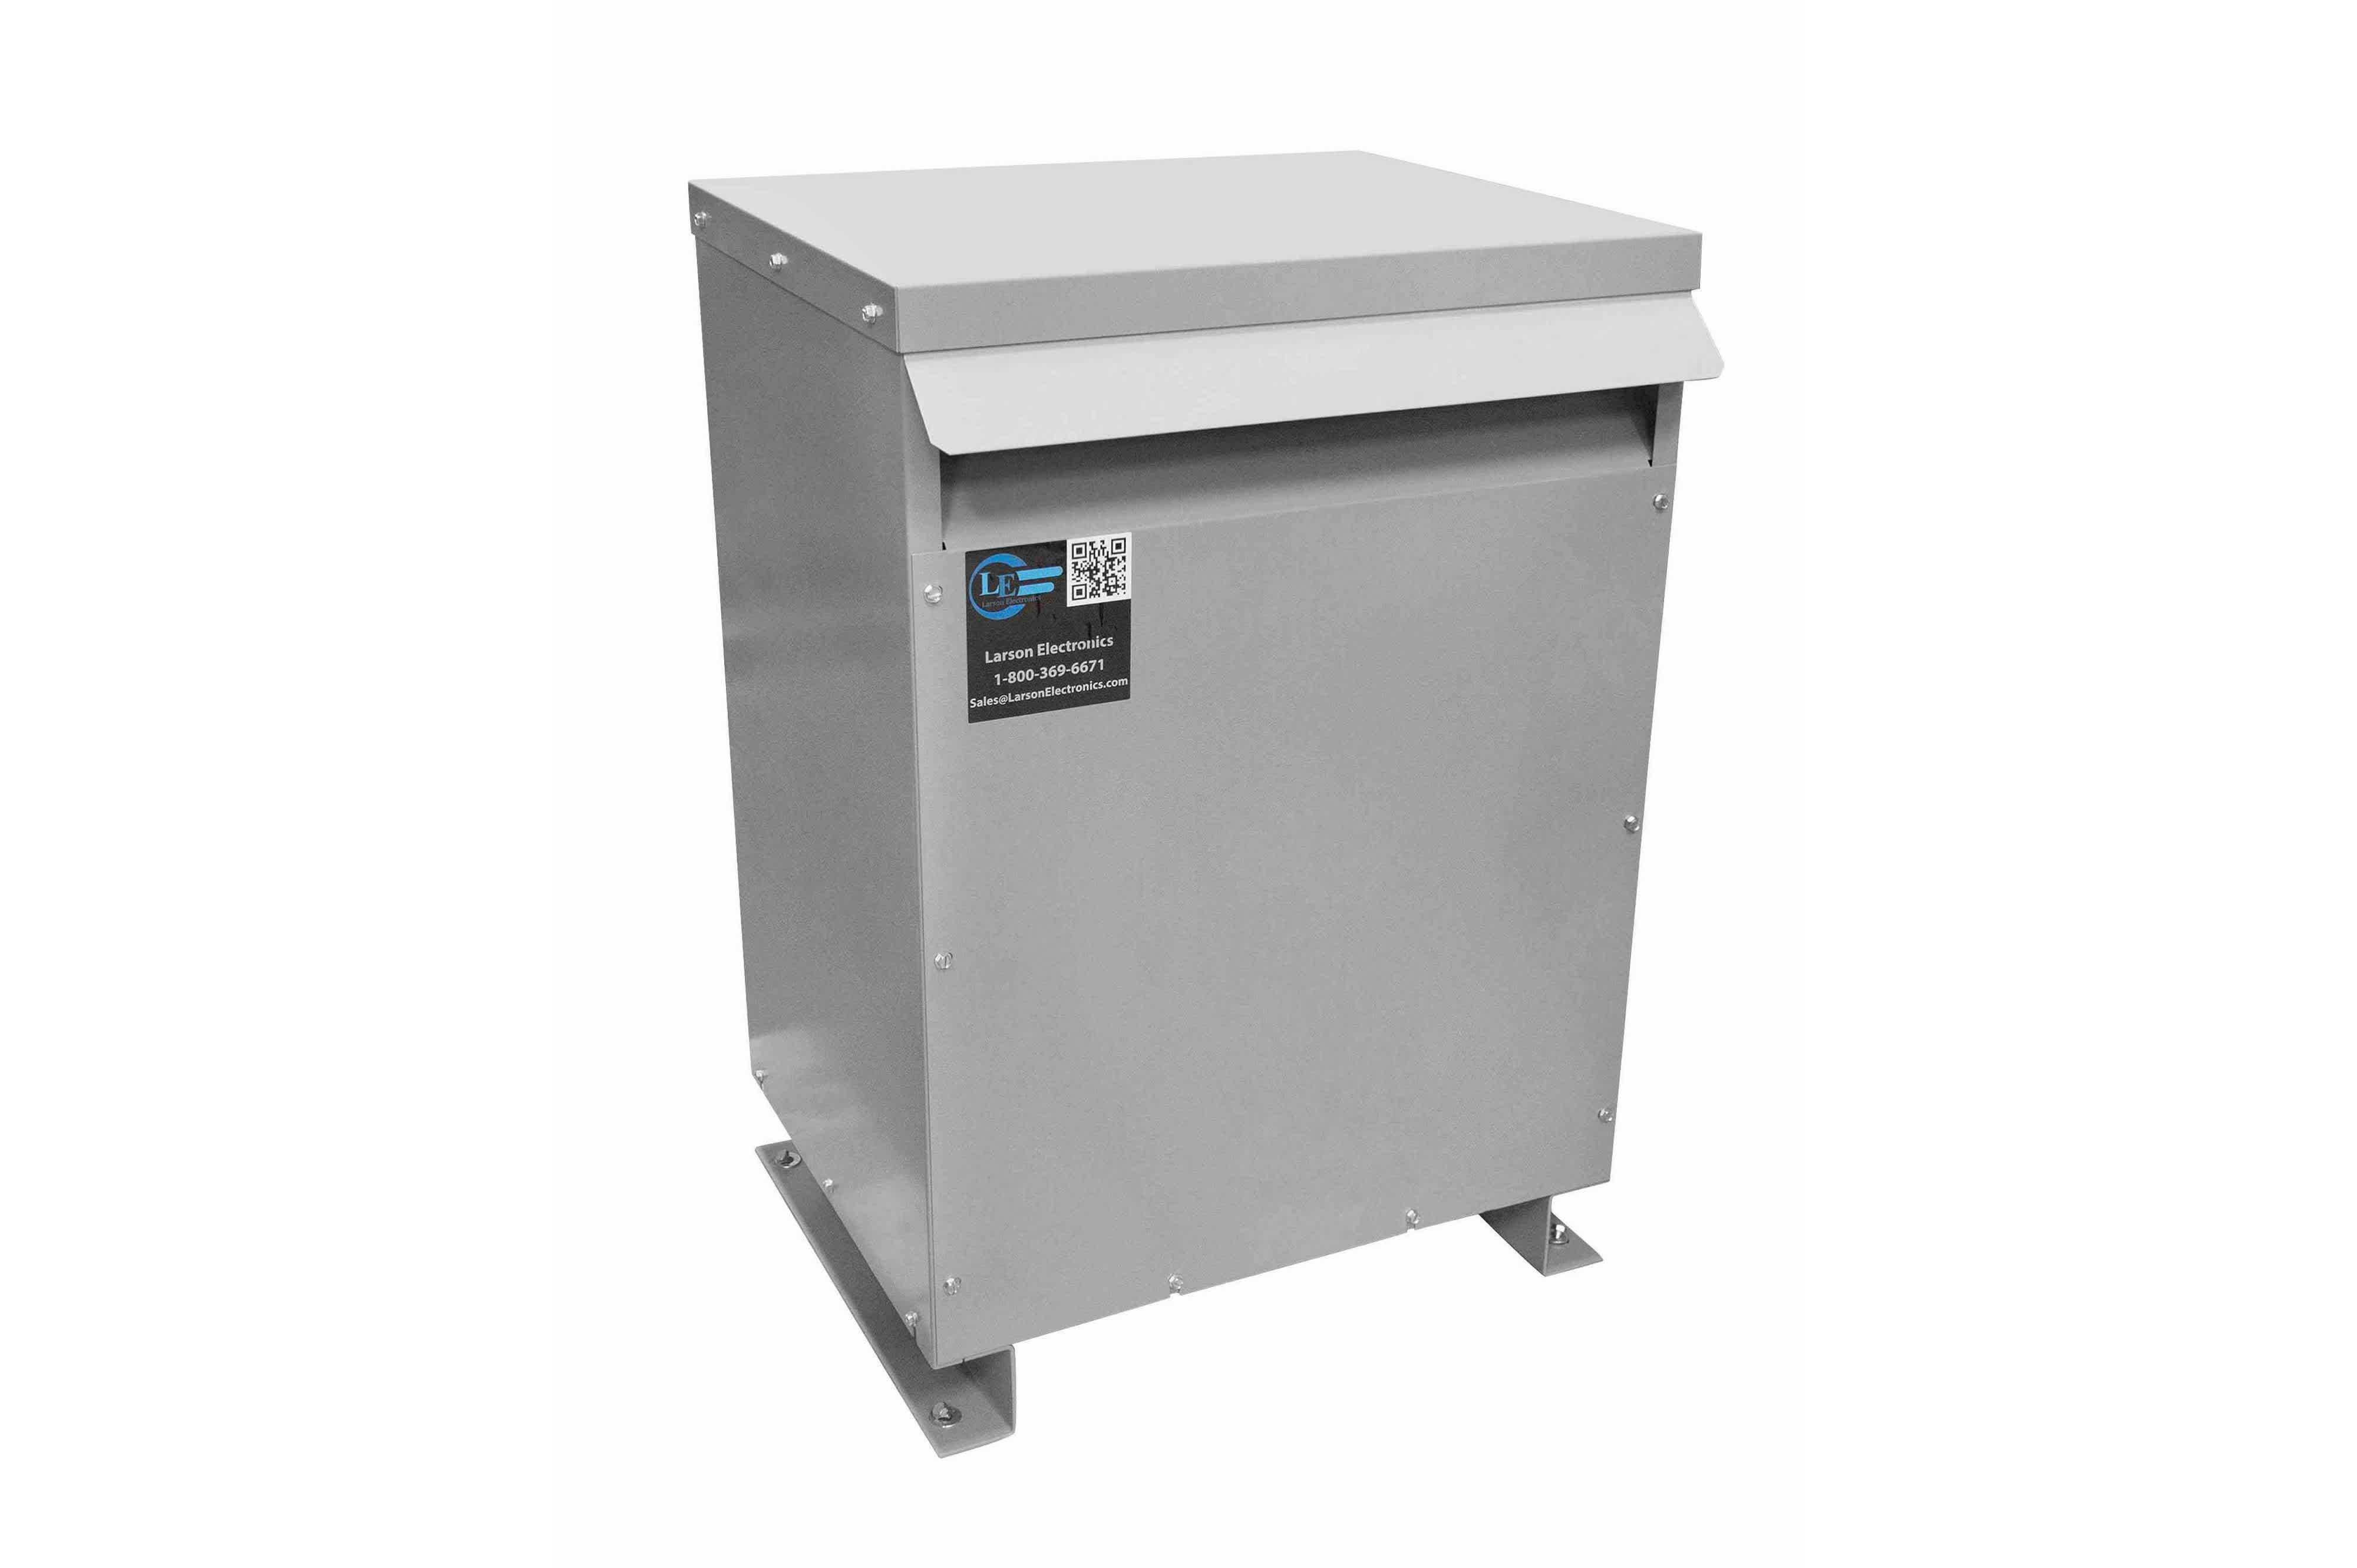 50 kVA 3PH Isolation Transformer, 208V Wye Primary, 600V Delta Secondary, N3R, Ventilated, 60 Hz